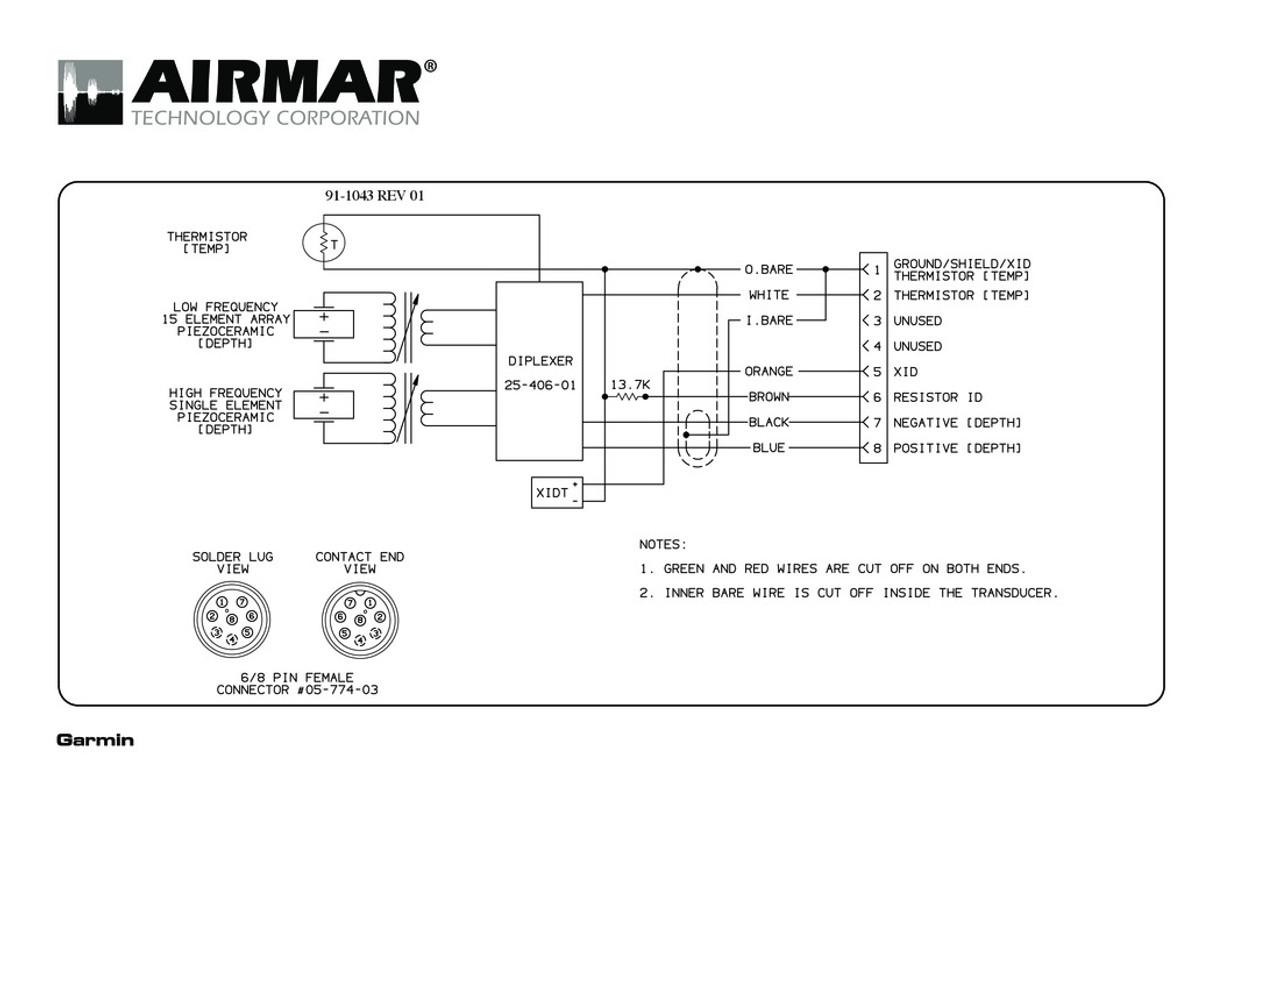 small resolution of airmar wiring diagram garmin r99 8 pin d t blue bottle marine garmin 8 pin wiring diagram